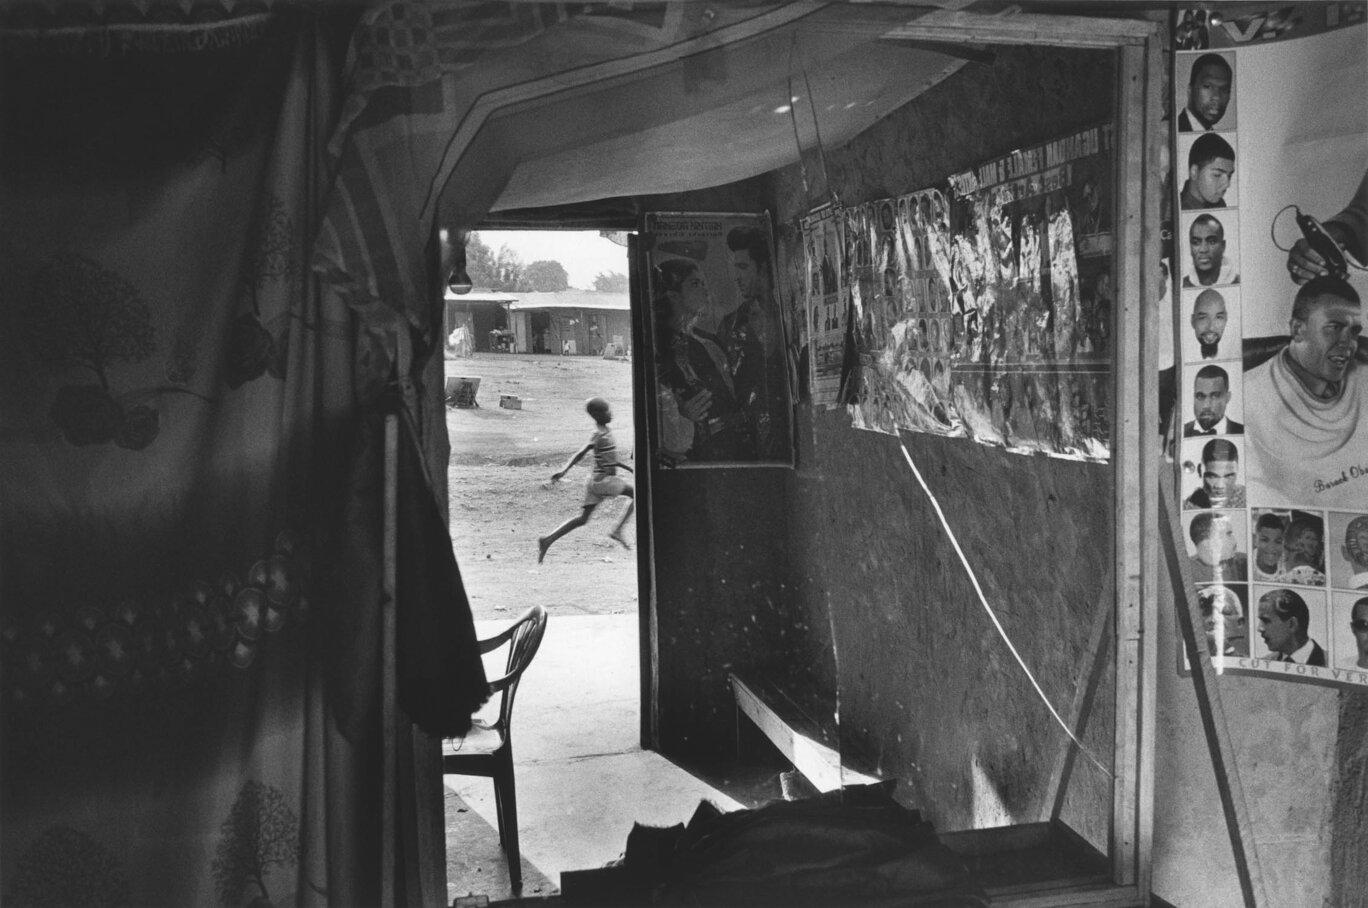 """Barbershop, Kiryandongo Refugee Settlement, Uganda"" by  Frederic de Woelmont  | Leica M6 + 35mm Lens + Ilford HP5 Film"